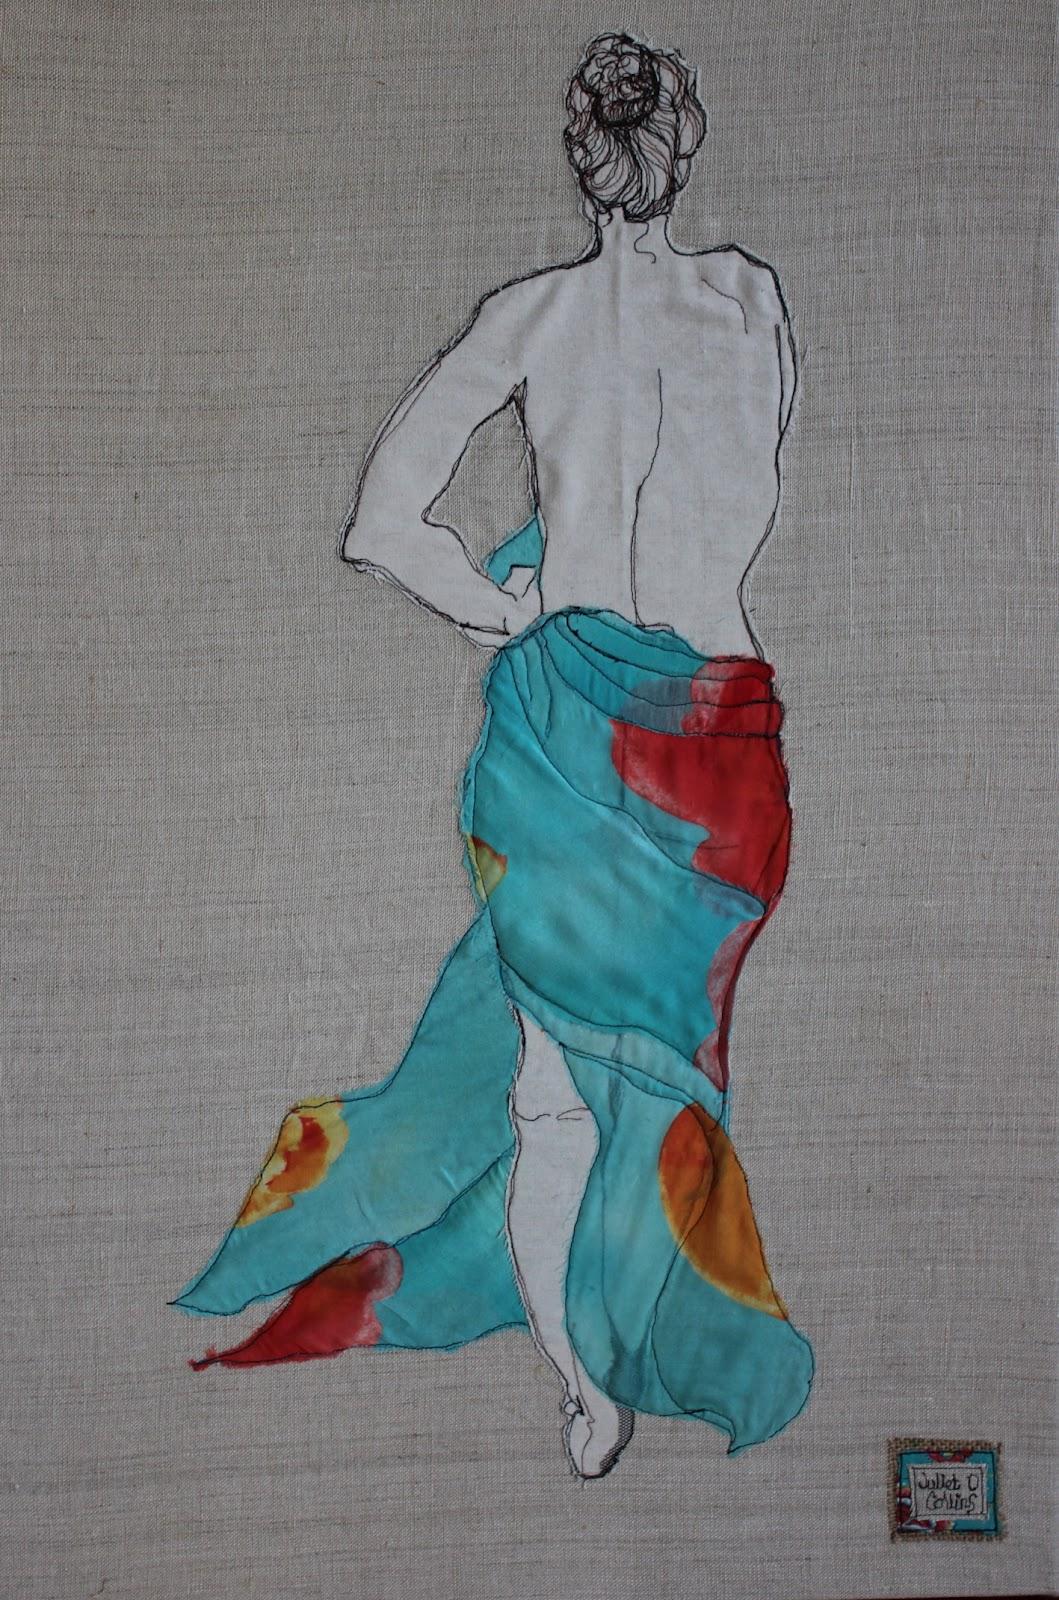 http://2.bp.blogspot.com/-QtEPbvlaWzk/UFVcfnN01xI/AAAAAAAAAV0/MRikLfOYHSY/s1600/sarong+(small).JPG